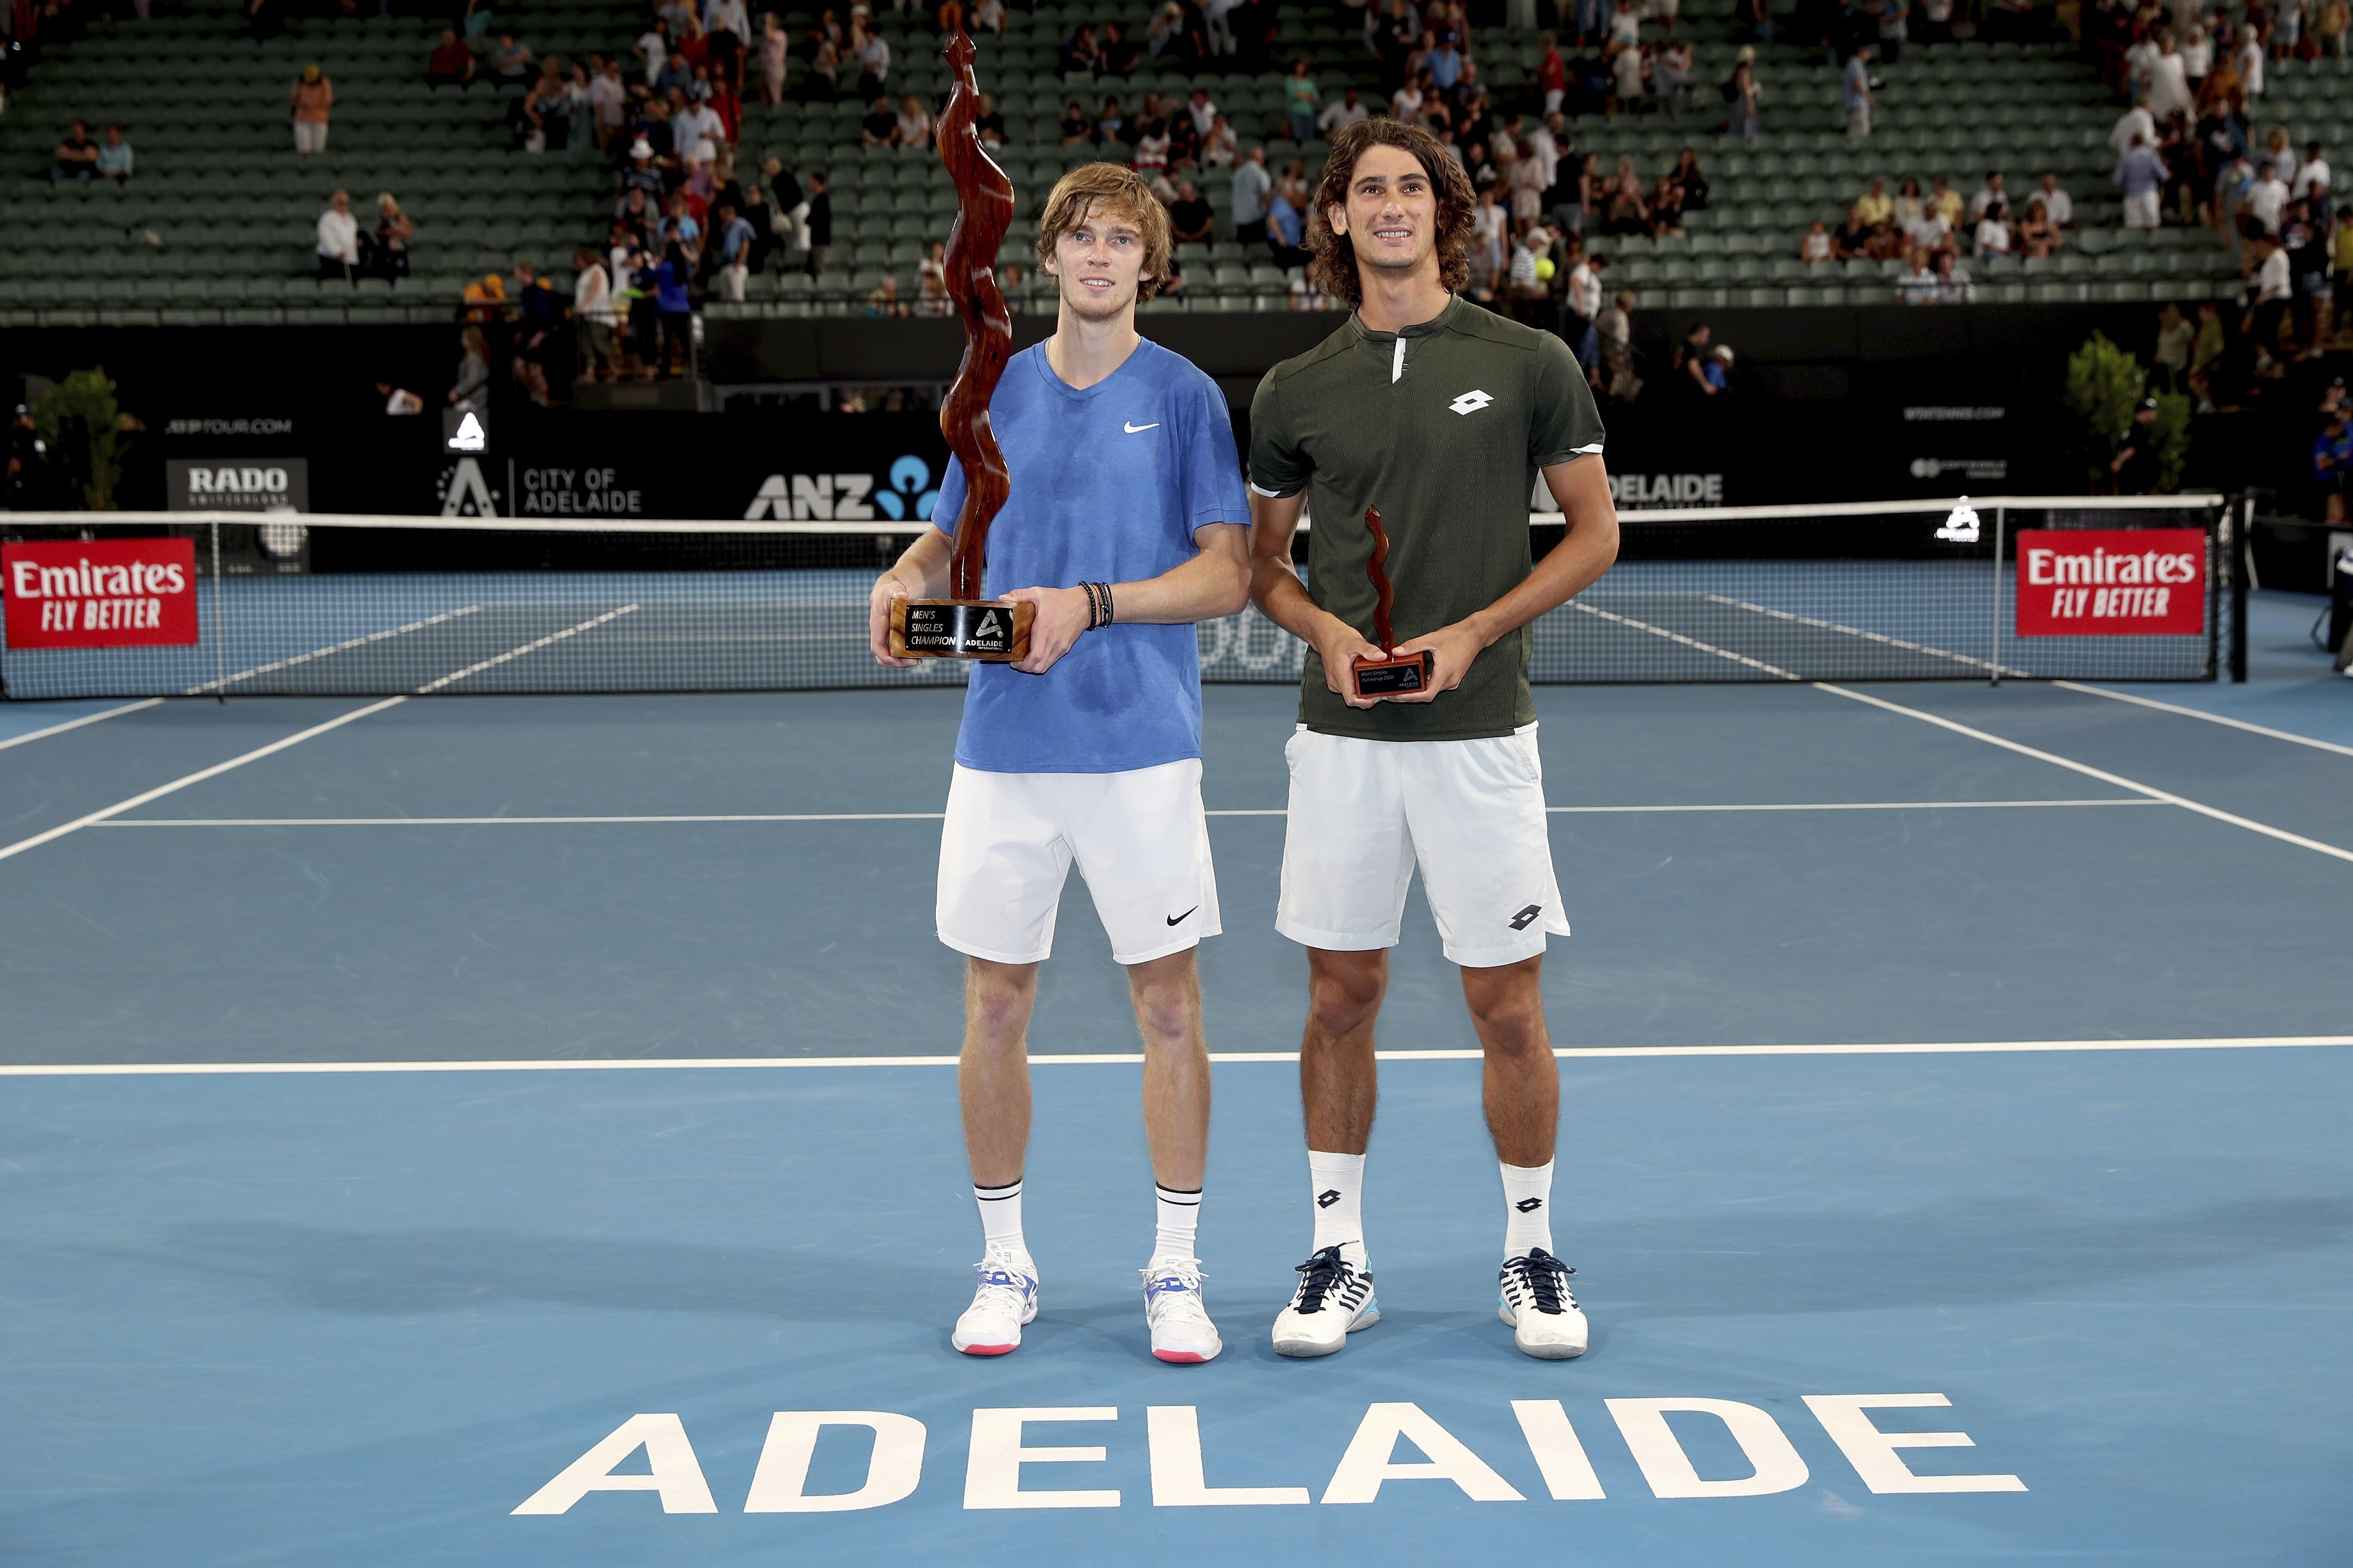 Barty, Rublev win Adelaide titles ahead of Australian Open